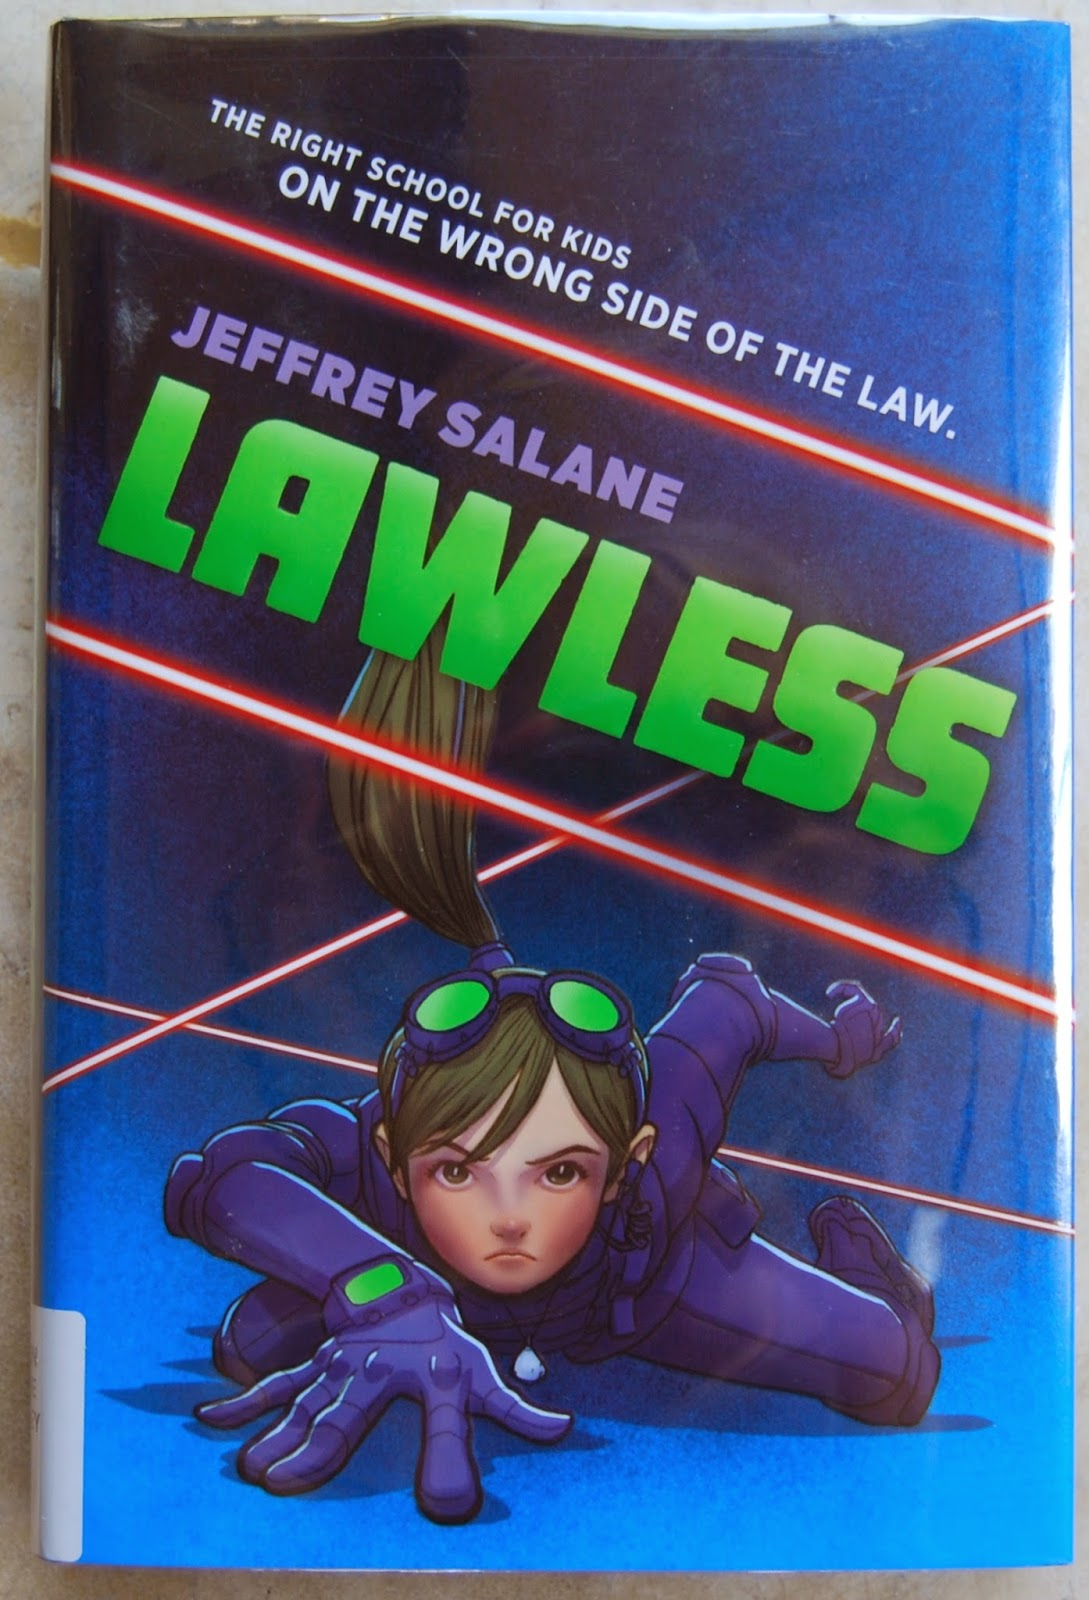 Lawless: Book 1: Jeffrey Salane: 9780545450294: Books - Amazon.ca